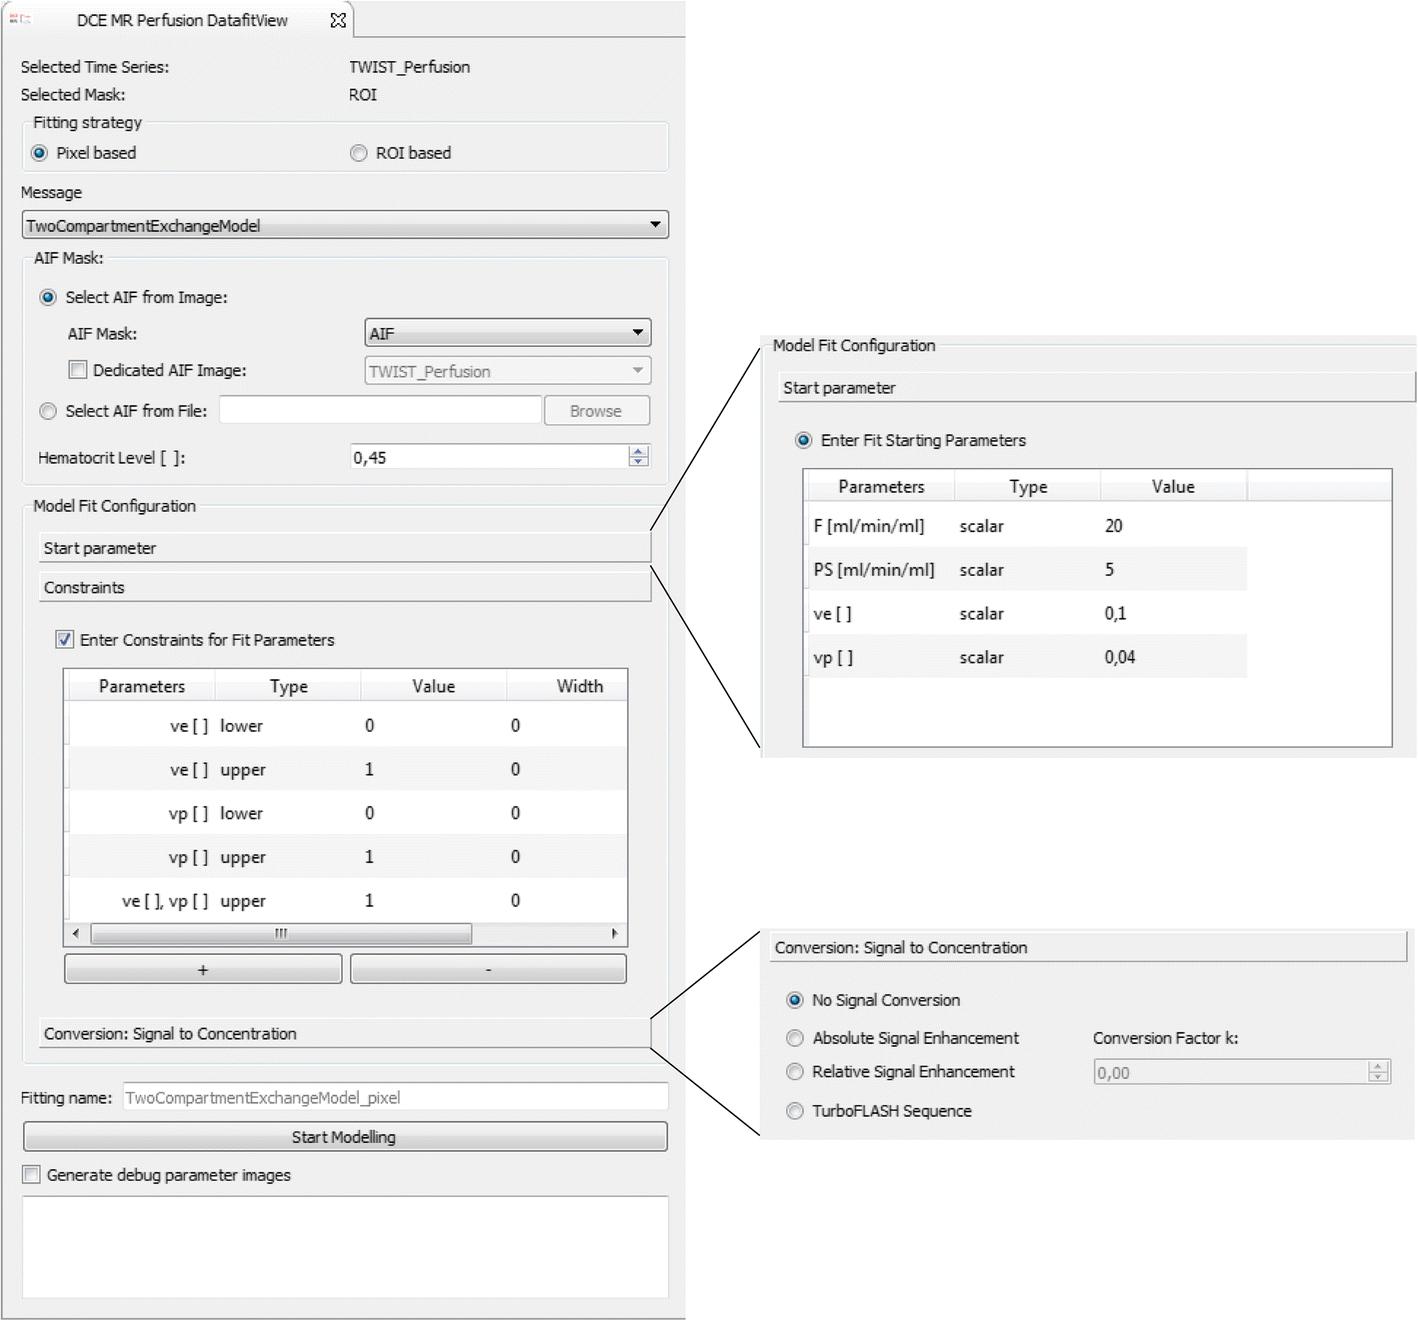 MITK-ModelFit: A generic open-source framework for model fits and